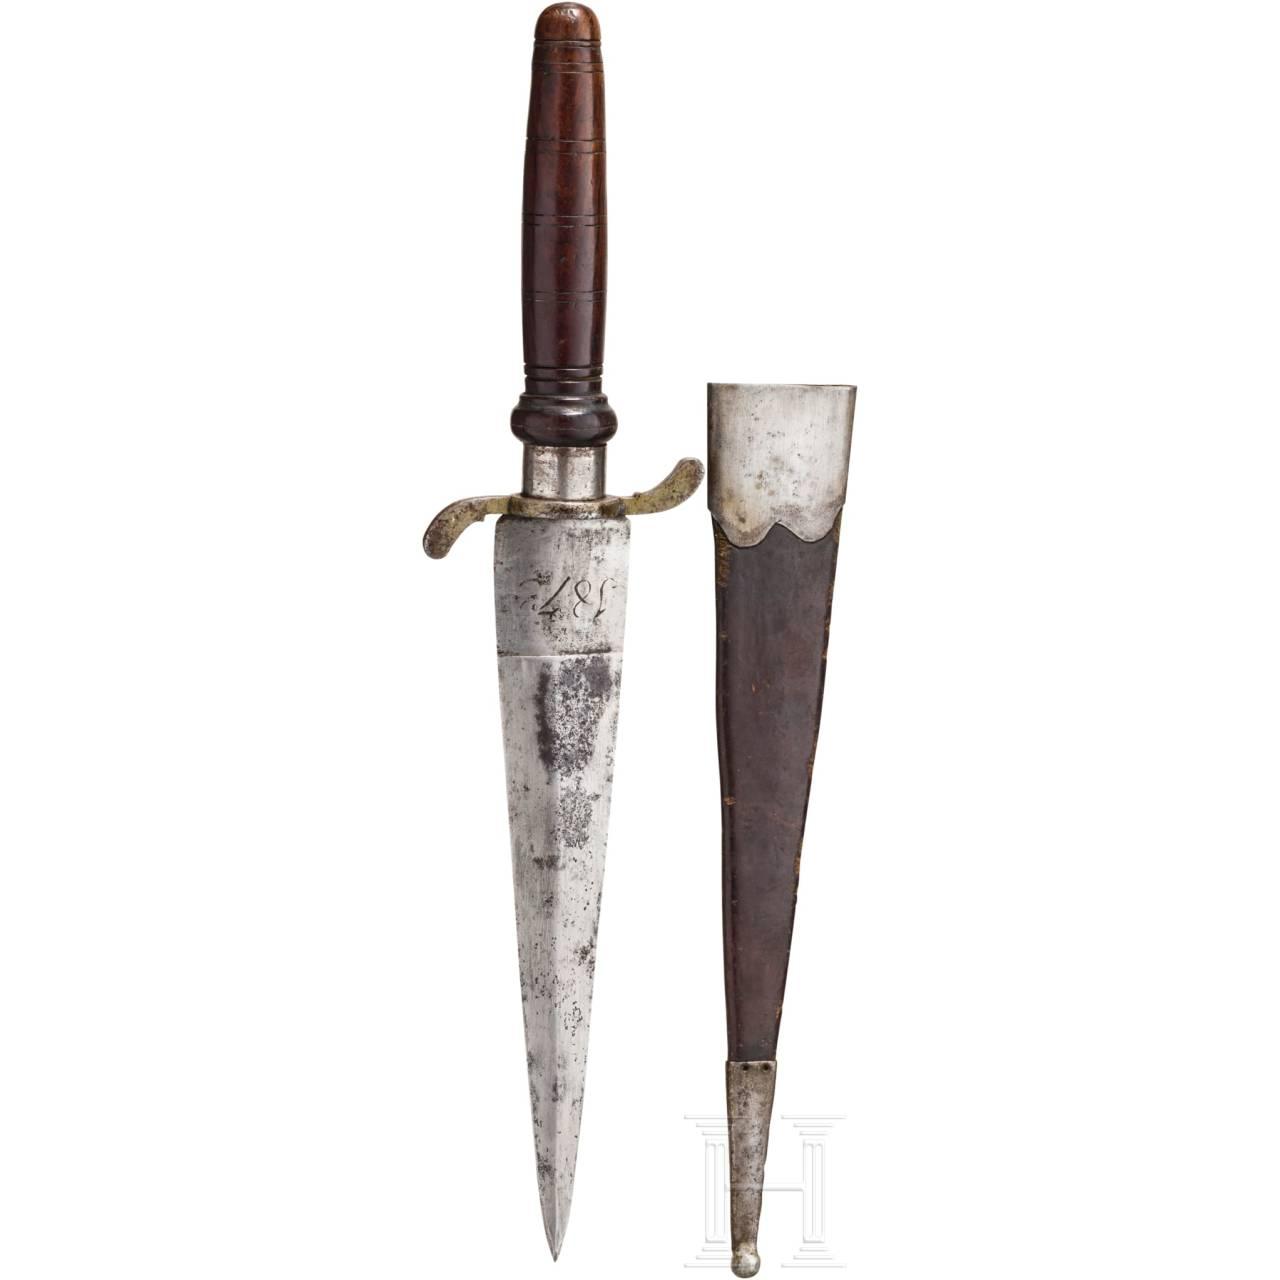 A German hunting plug bayonet, dated 1873